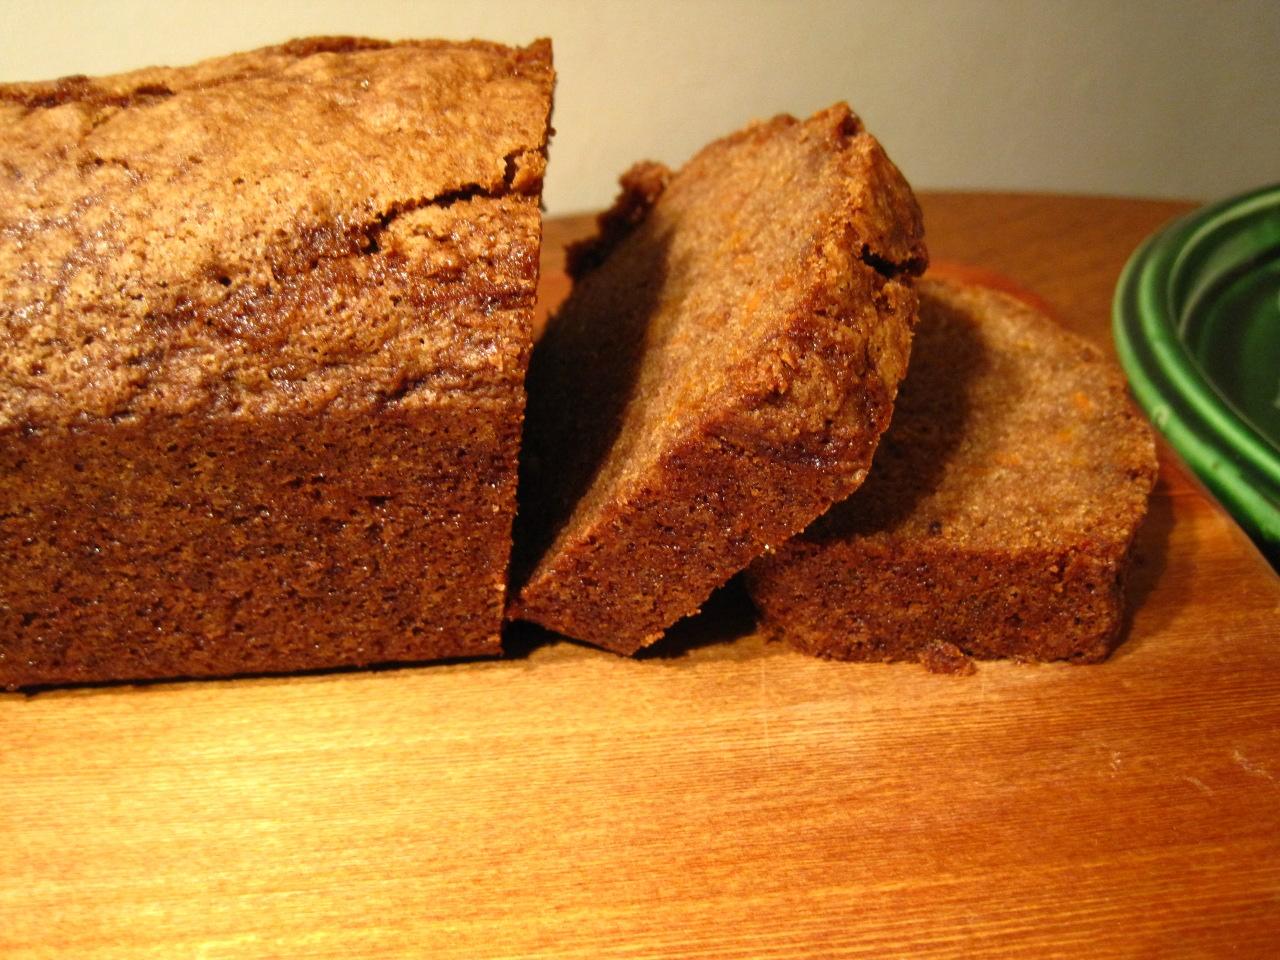 Loaf Cake Recipes Nz: Lovely Wee Days: Thursday Baking